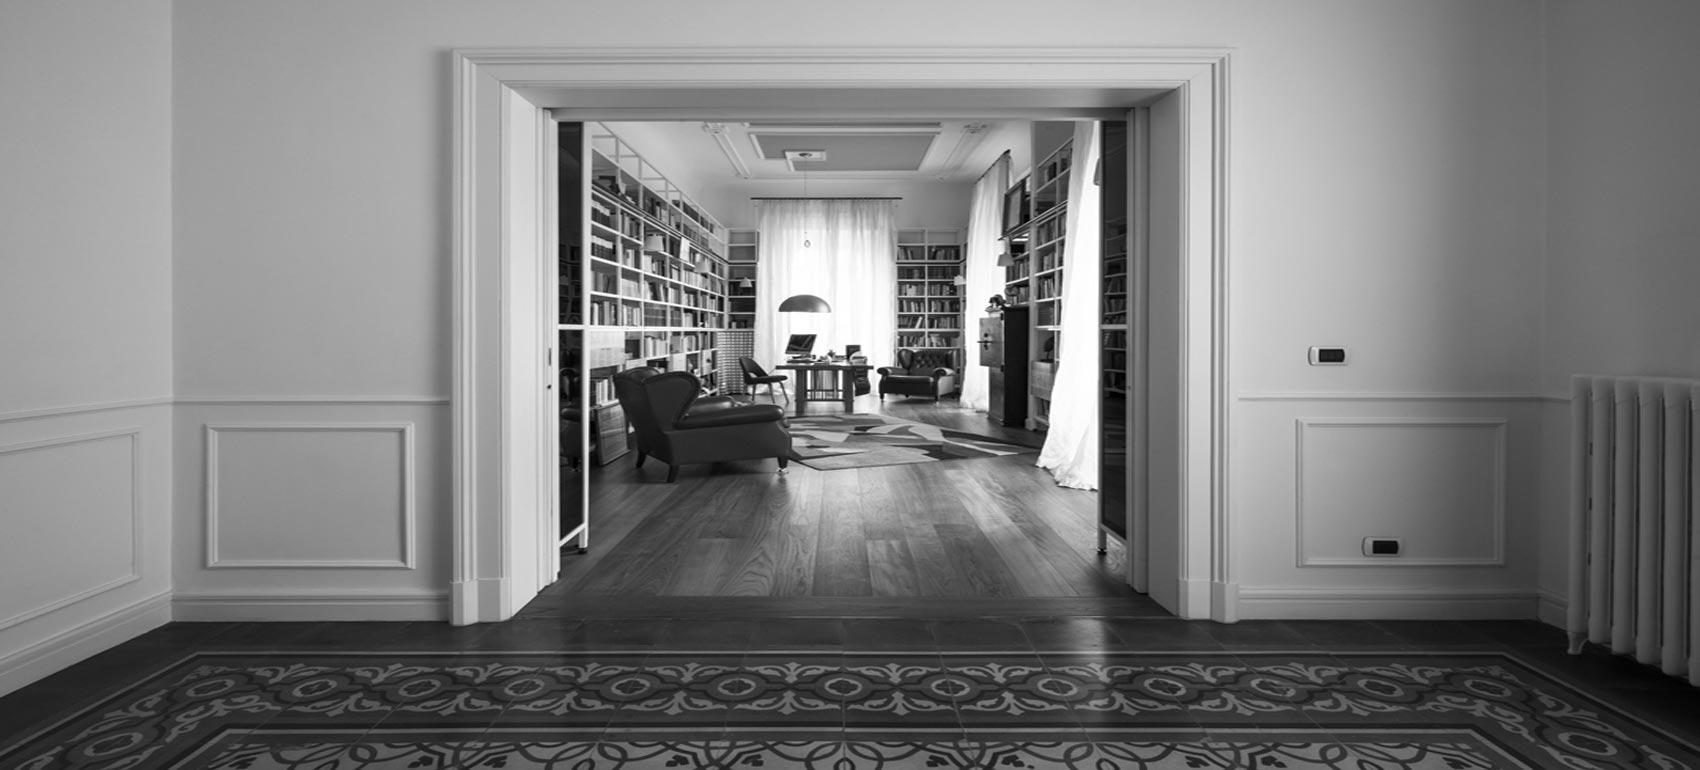 stefanoturi-architetto_residenzaprivata2_1